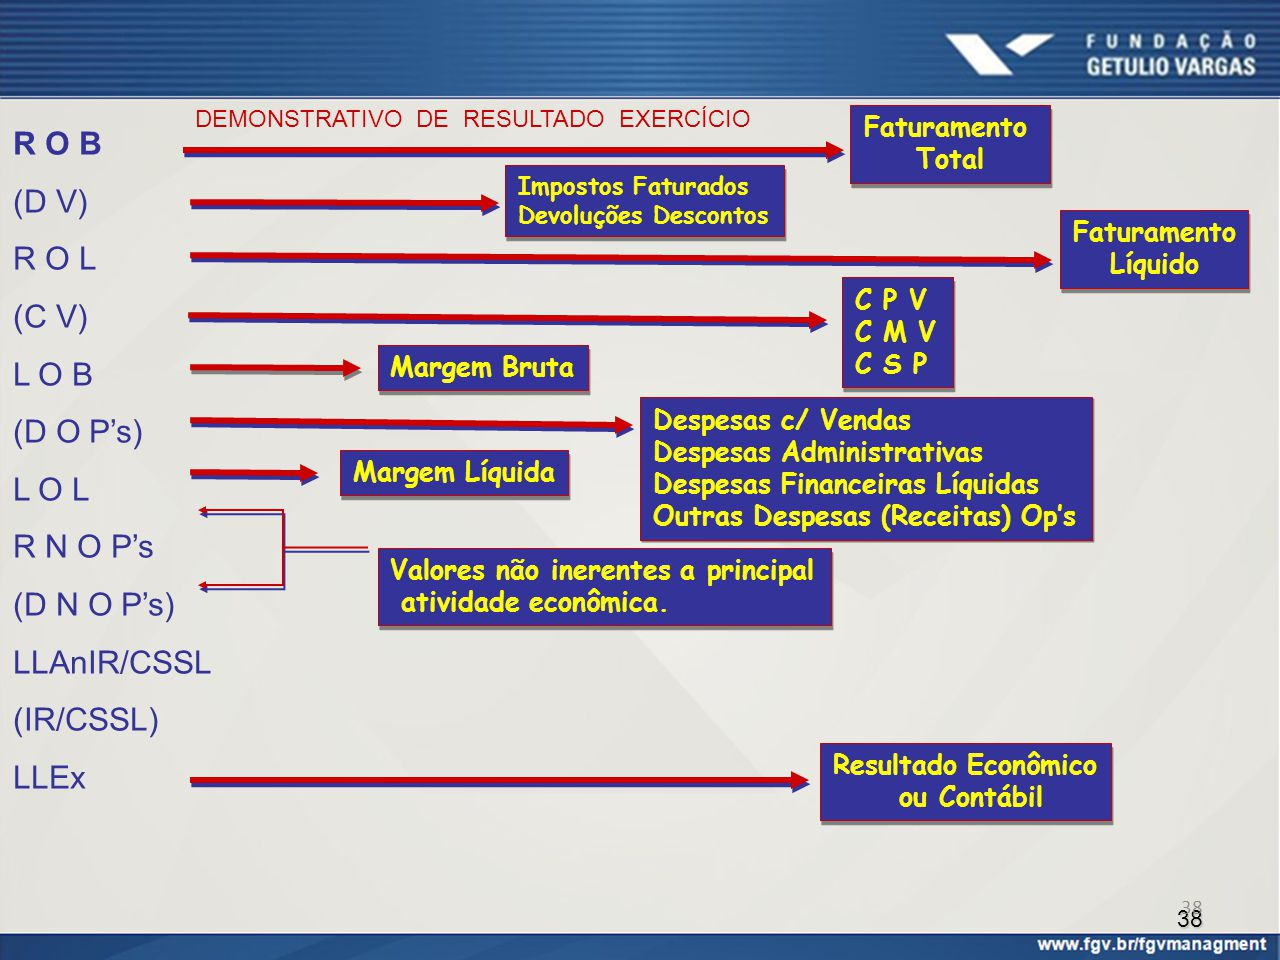 38 R O B (D V) R O L (C V) L O B (D O P's) L O L R N O P's (D N O P's) LLAnIR/CSSL (IR/CSSL) LLEx Impostos Faturados Devoluções Descontos Impostos Fat